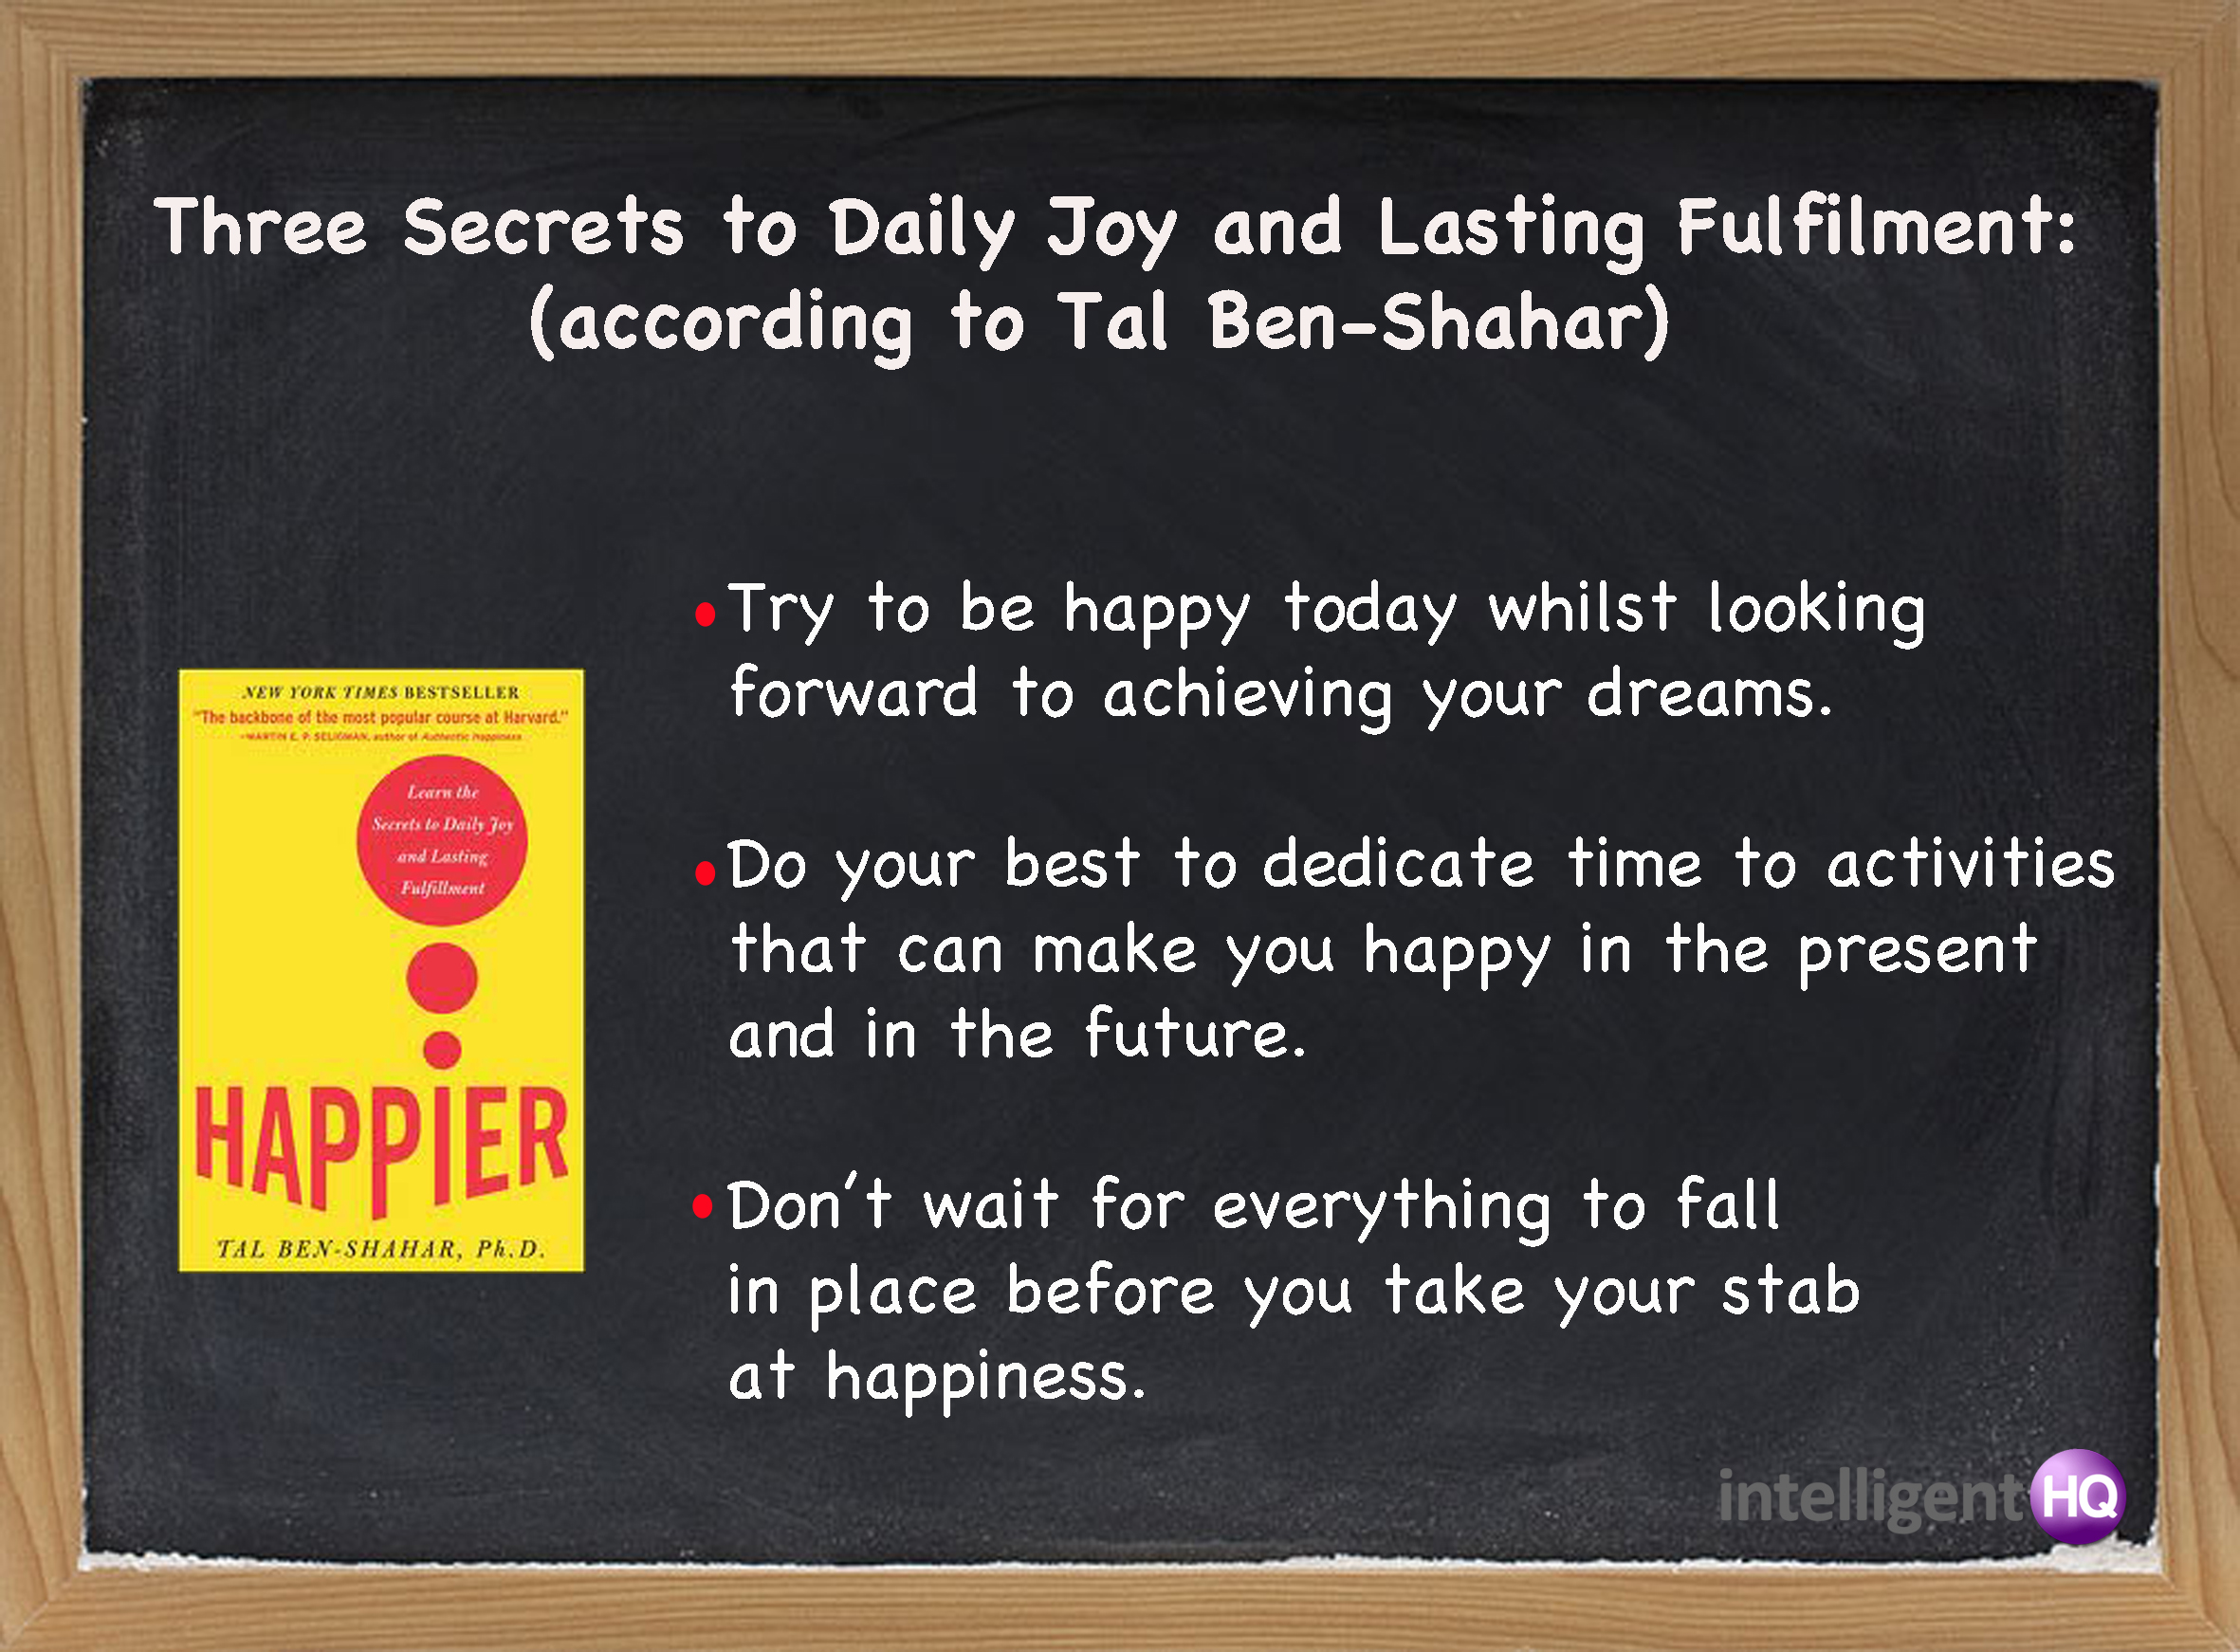 Three Secrets To Daily Joy, according to Tal Ben Shahar. Intelligenthq